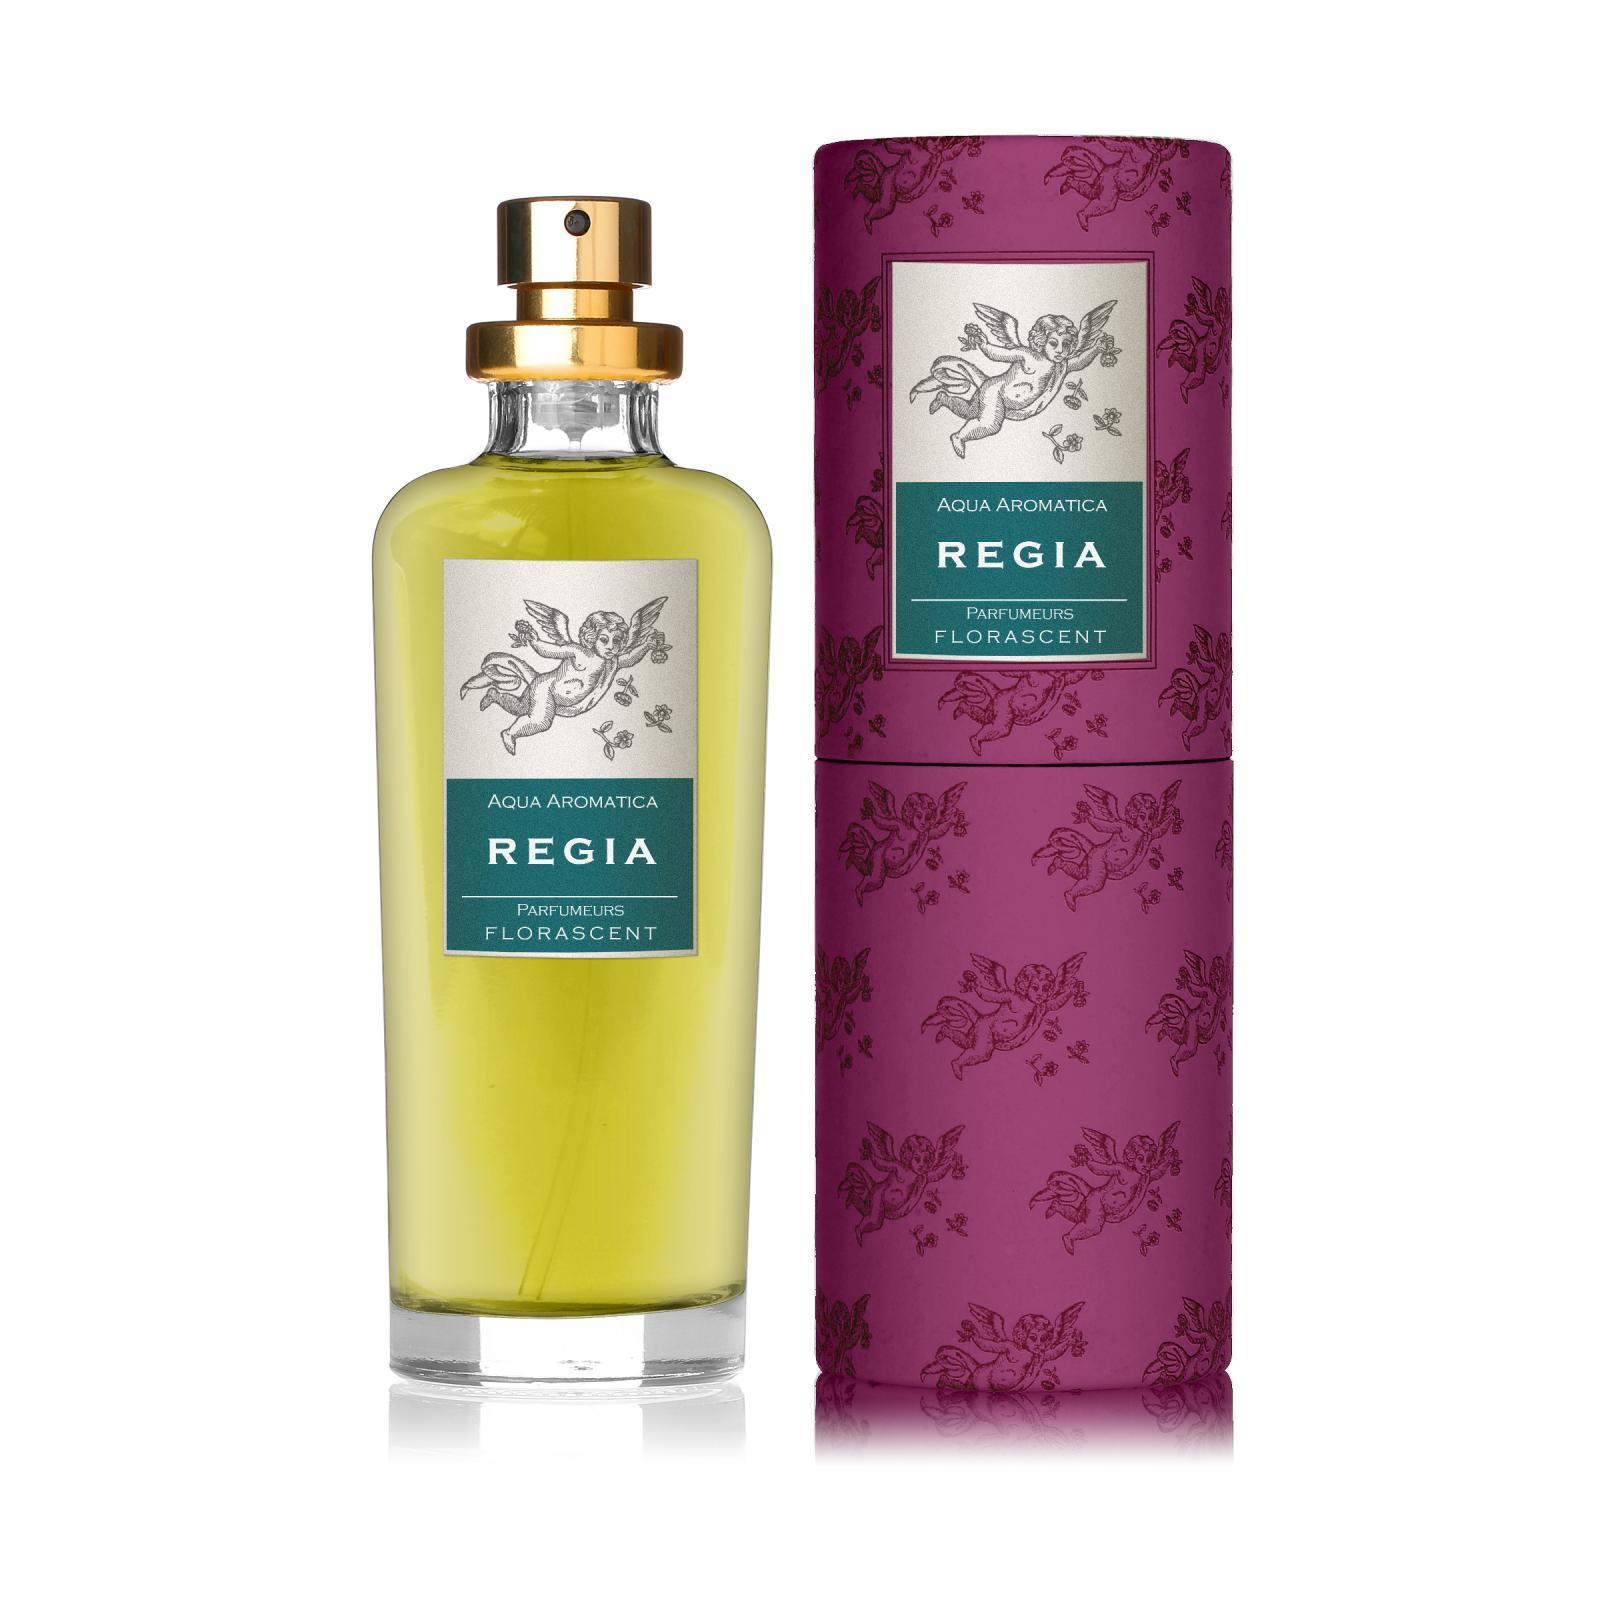 Florascent Toaletní voda Regia, Aqua Aromatica 60 ml